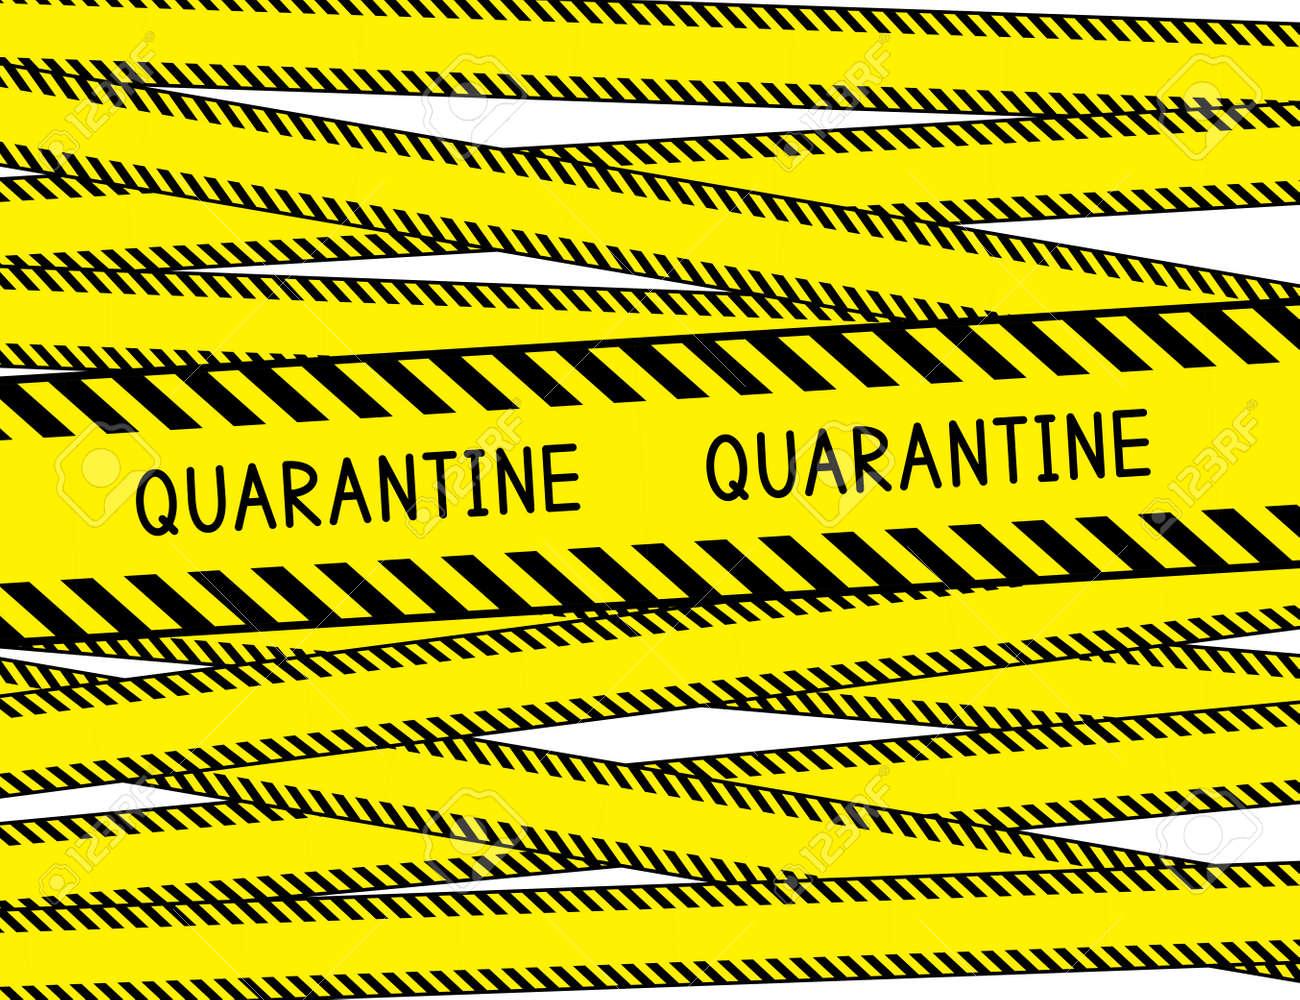 Quarantine. Restricted area. Quarantine zone. Warning stripes. Vector illustration. - 146261706